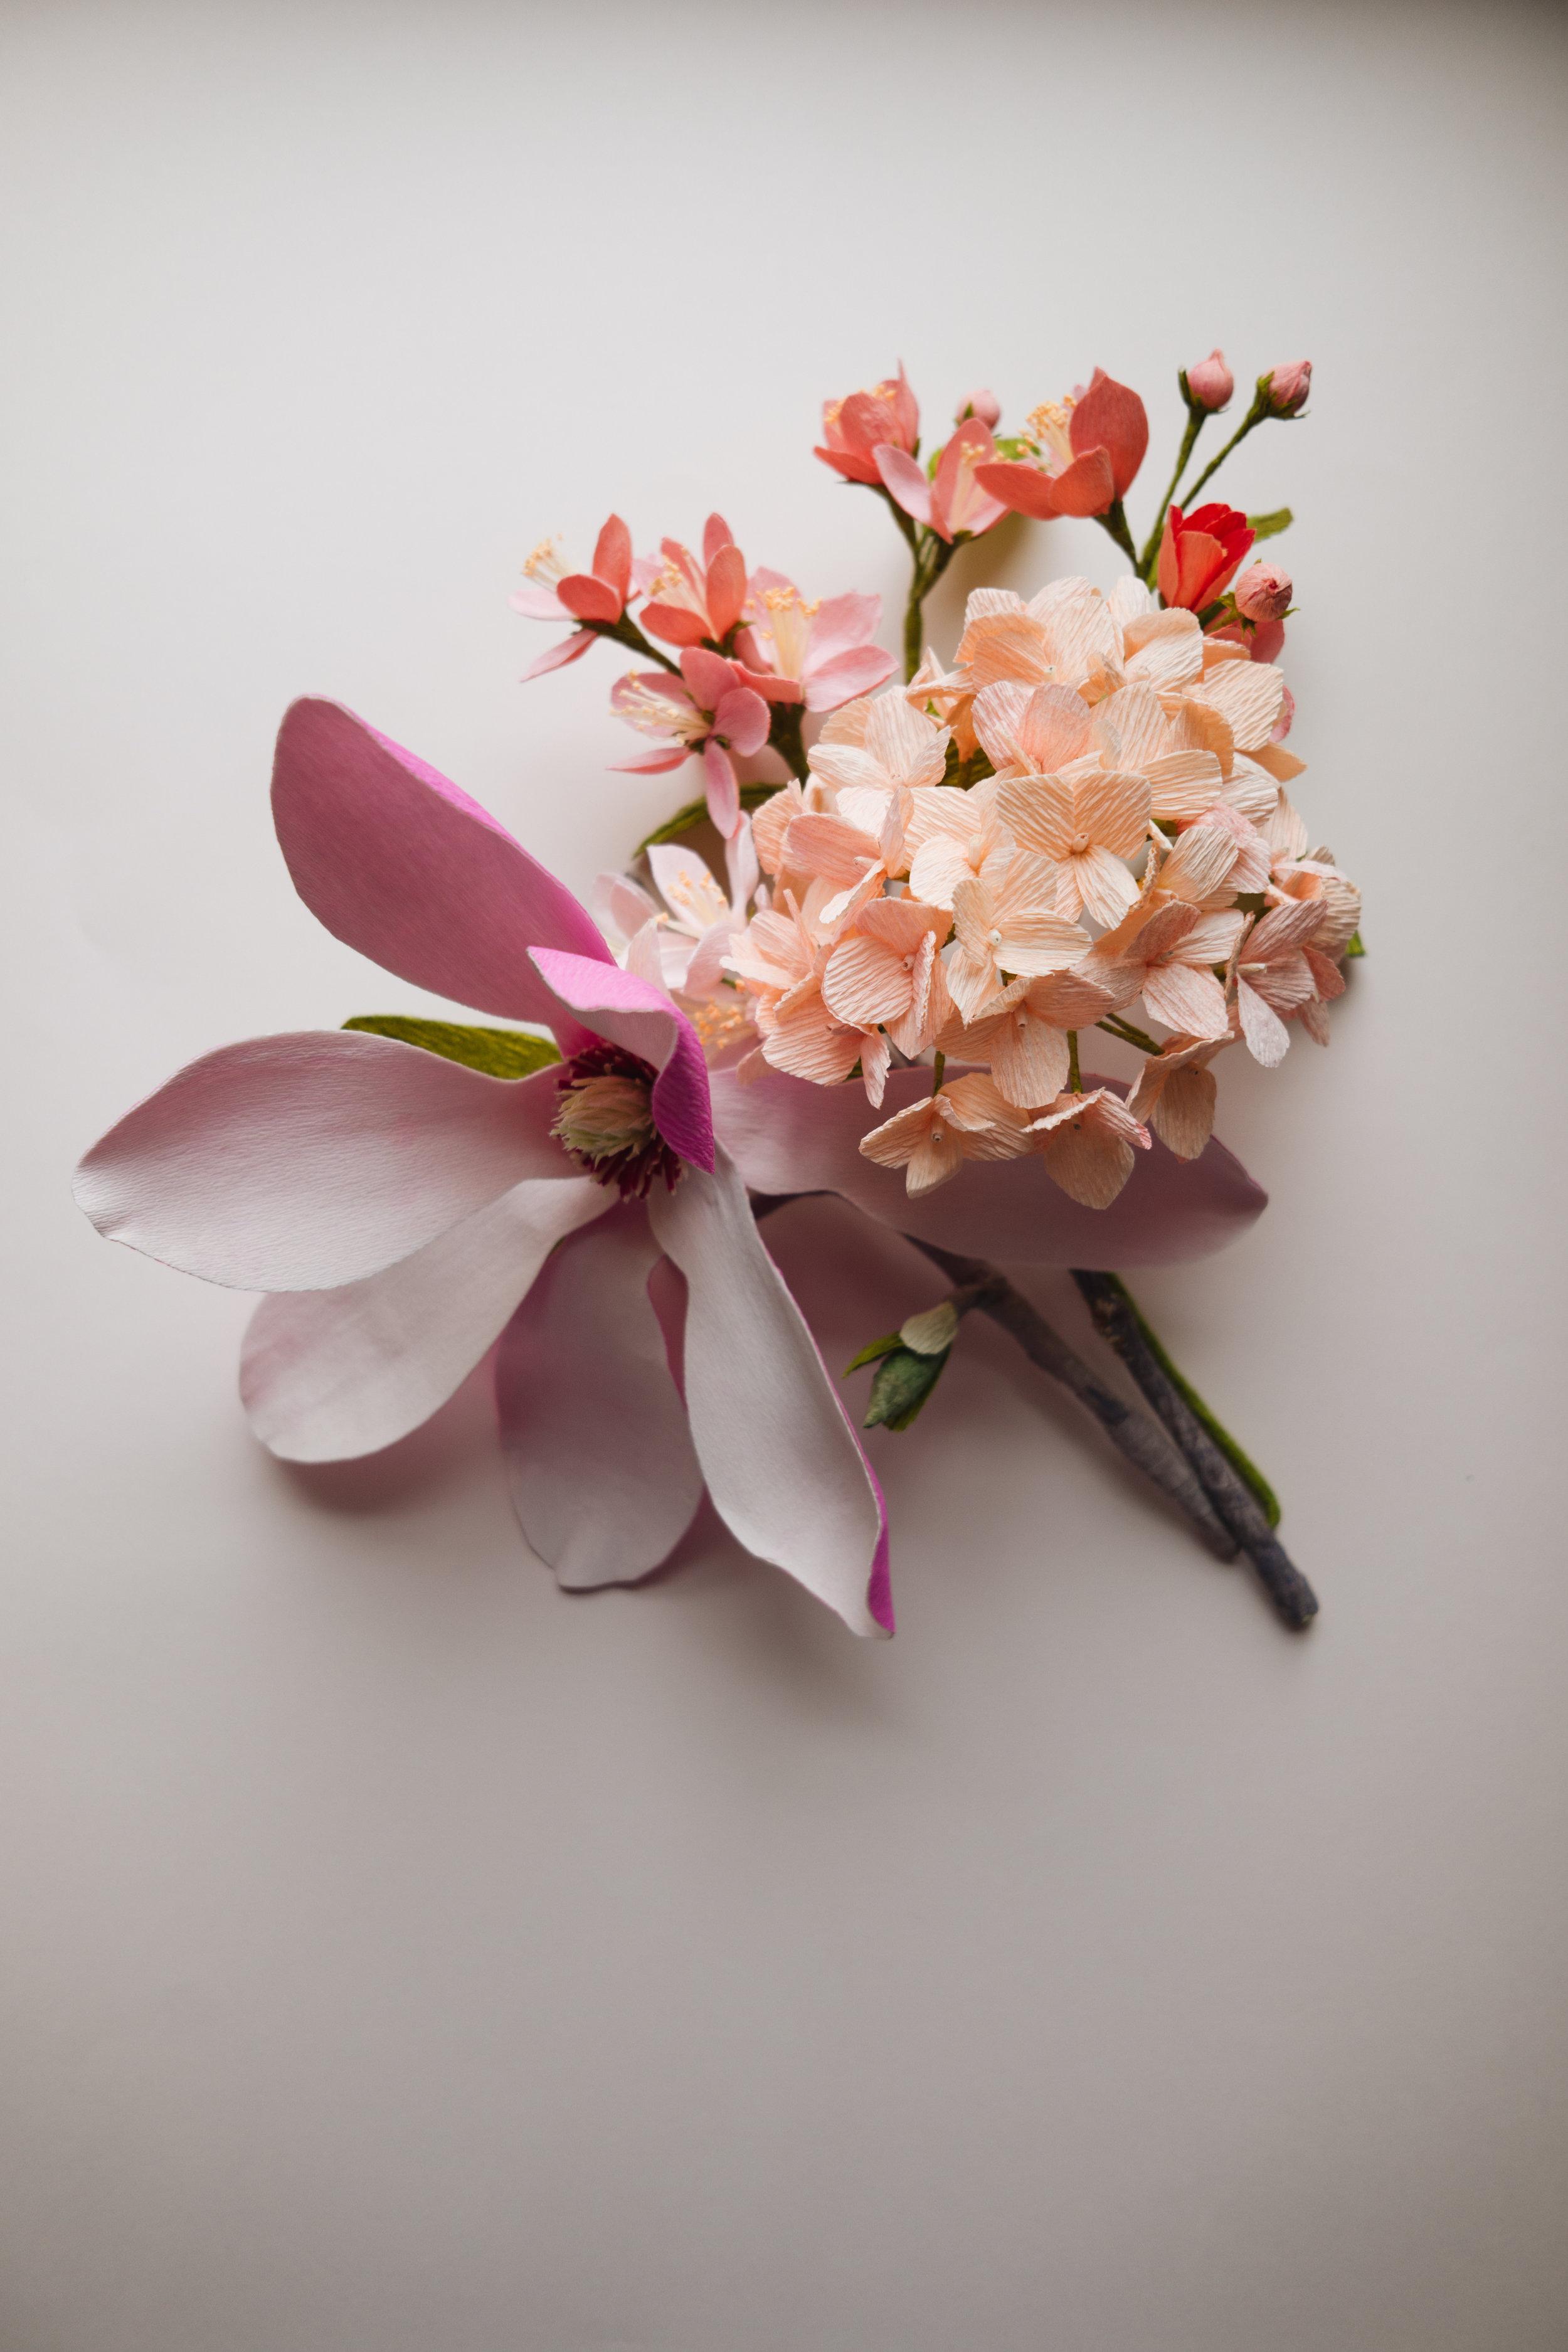 MagnoliaBlossomHydrangea-1000649.jpg